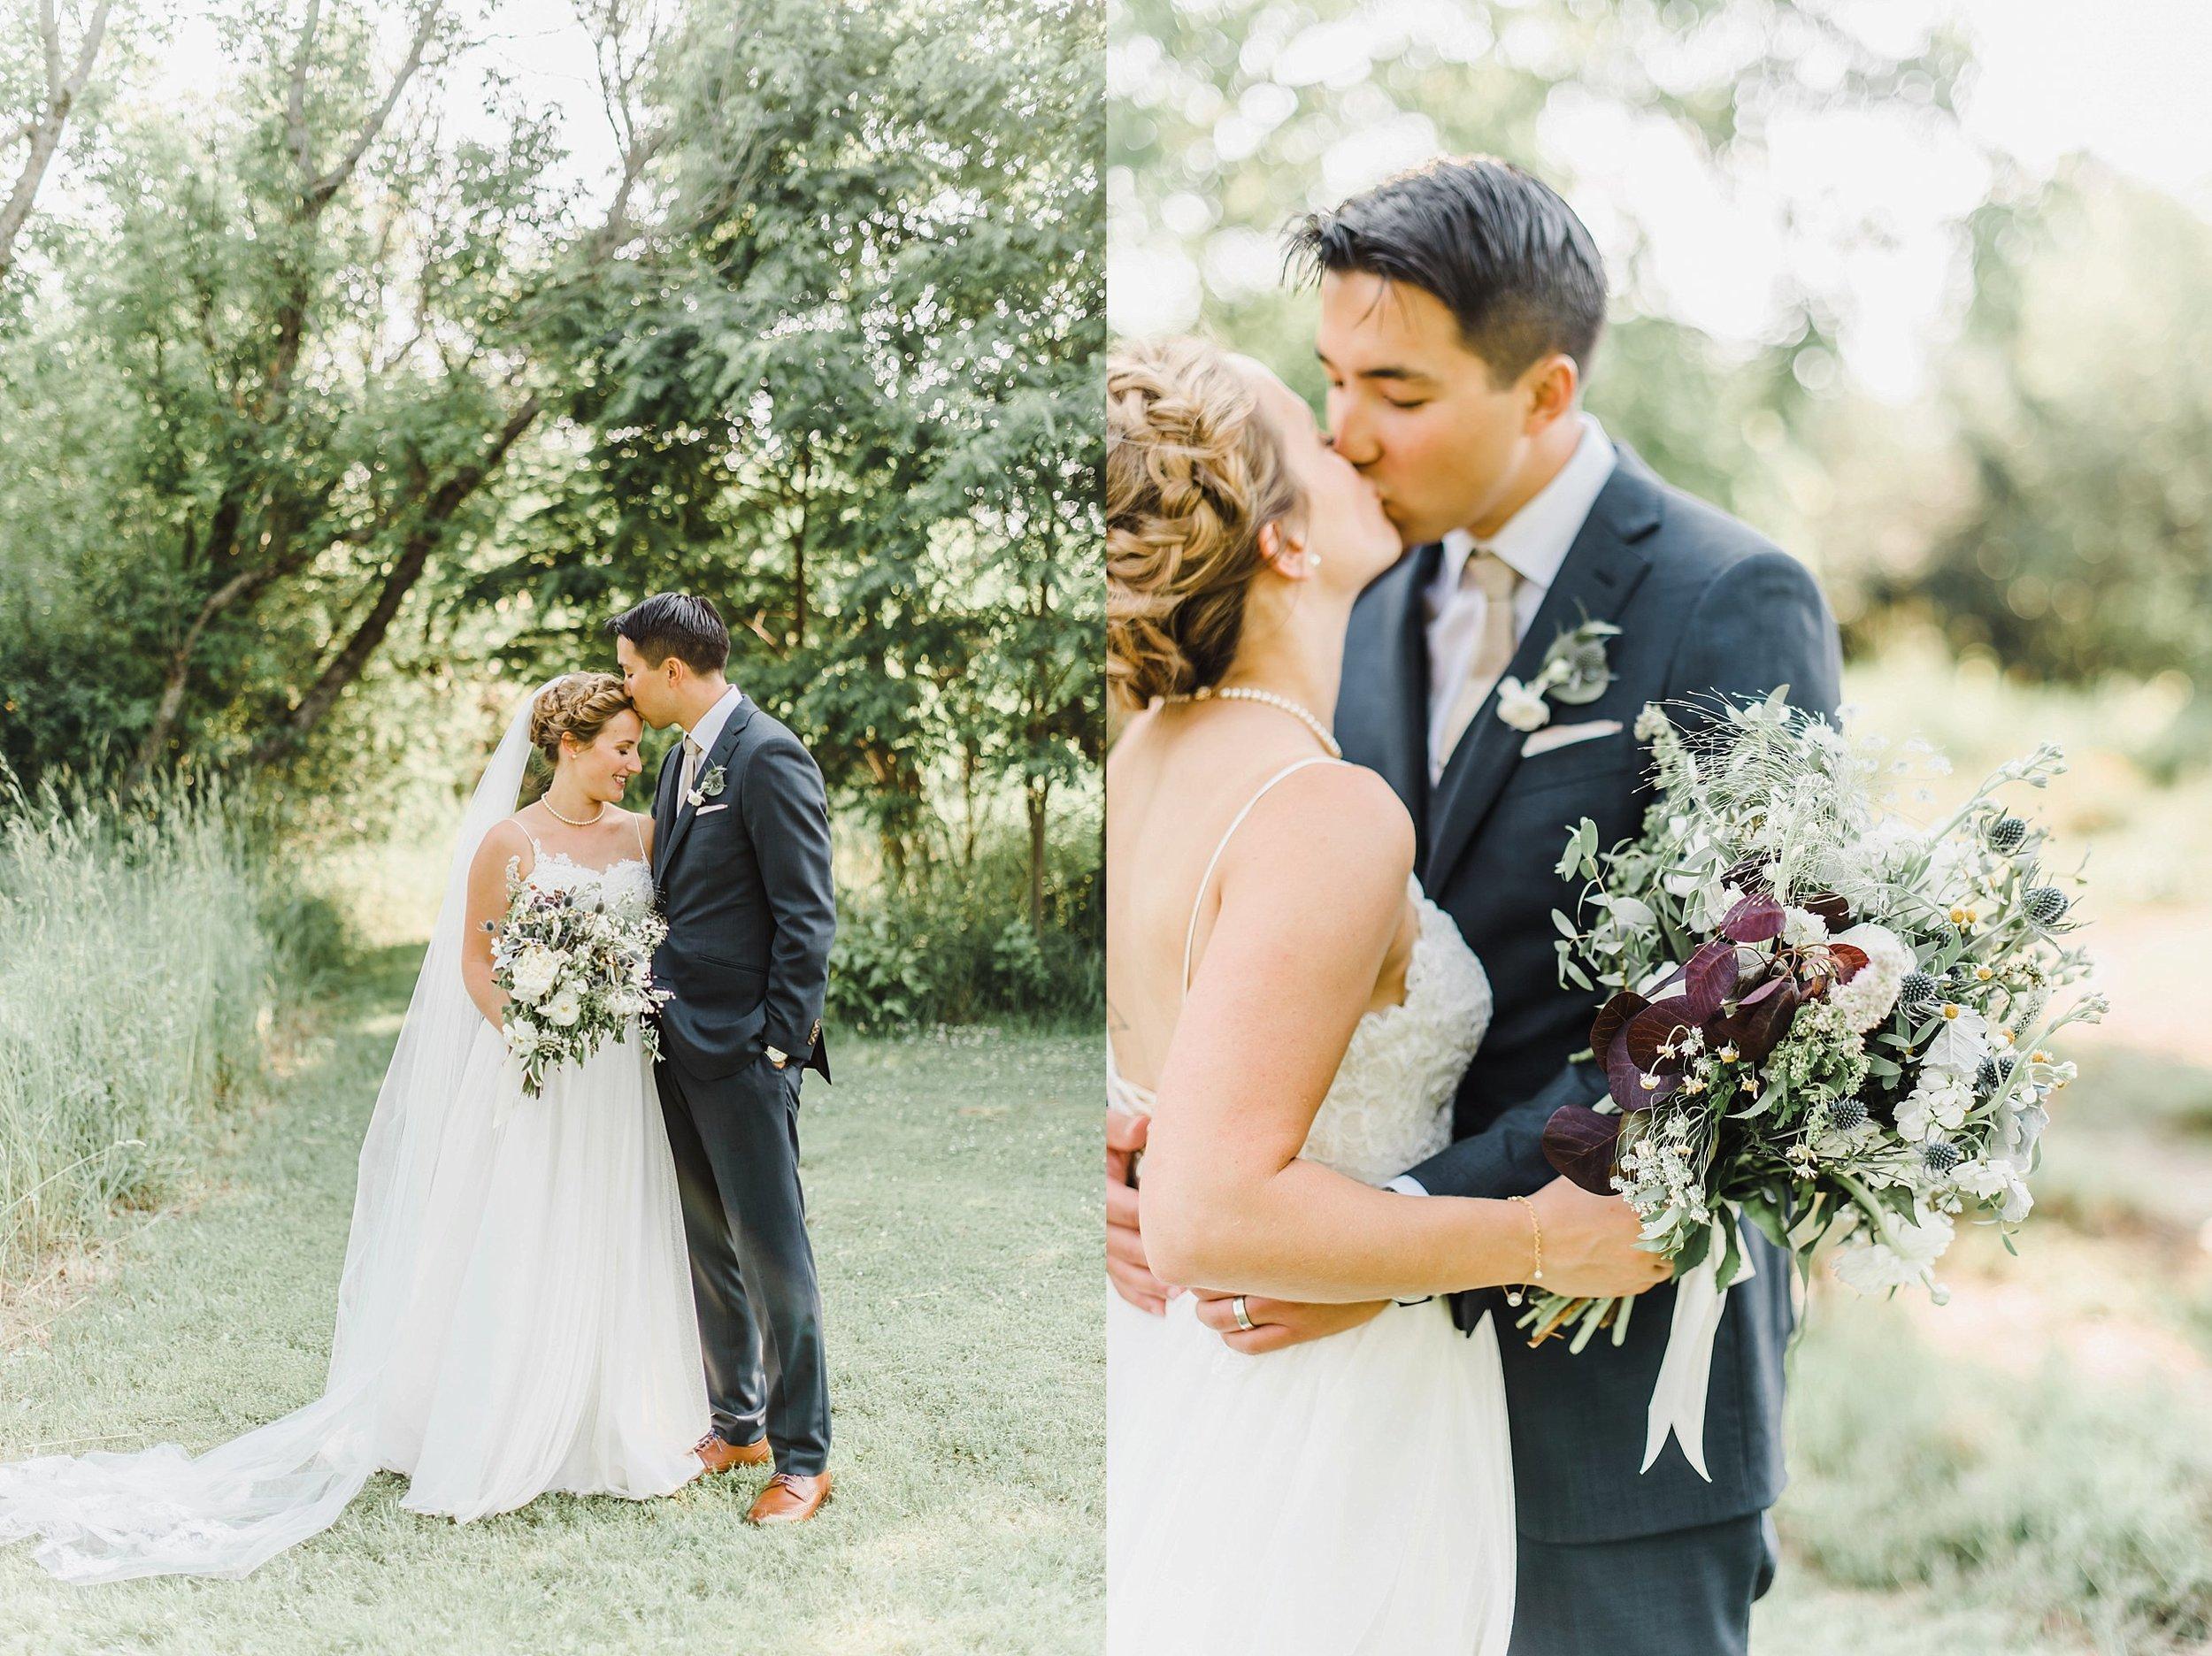 light airy indie fine art ottawa wedding photographer | Ali and Batoul Photography_0834.jpg